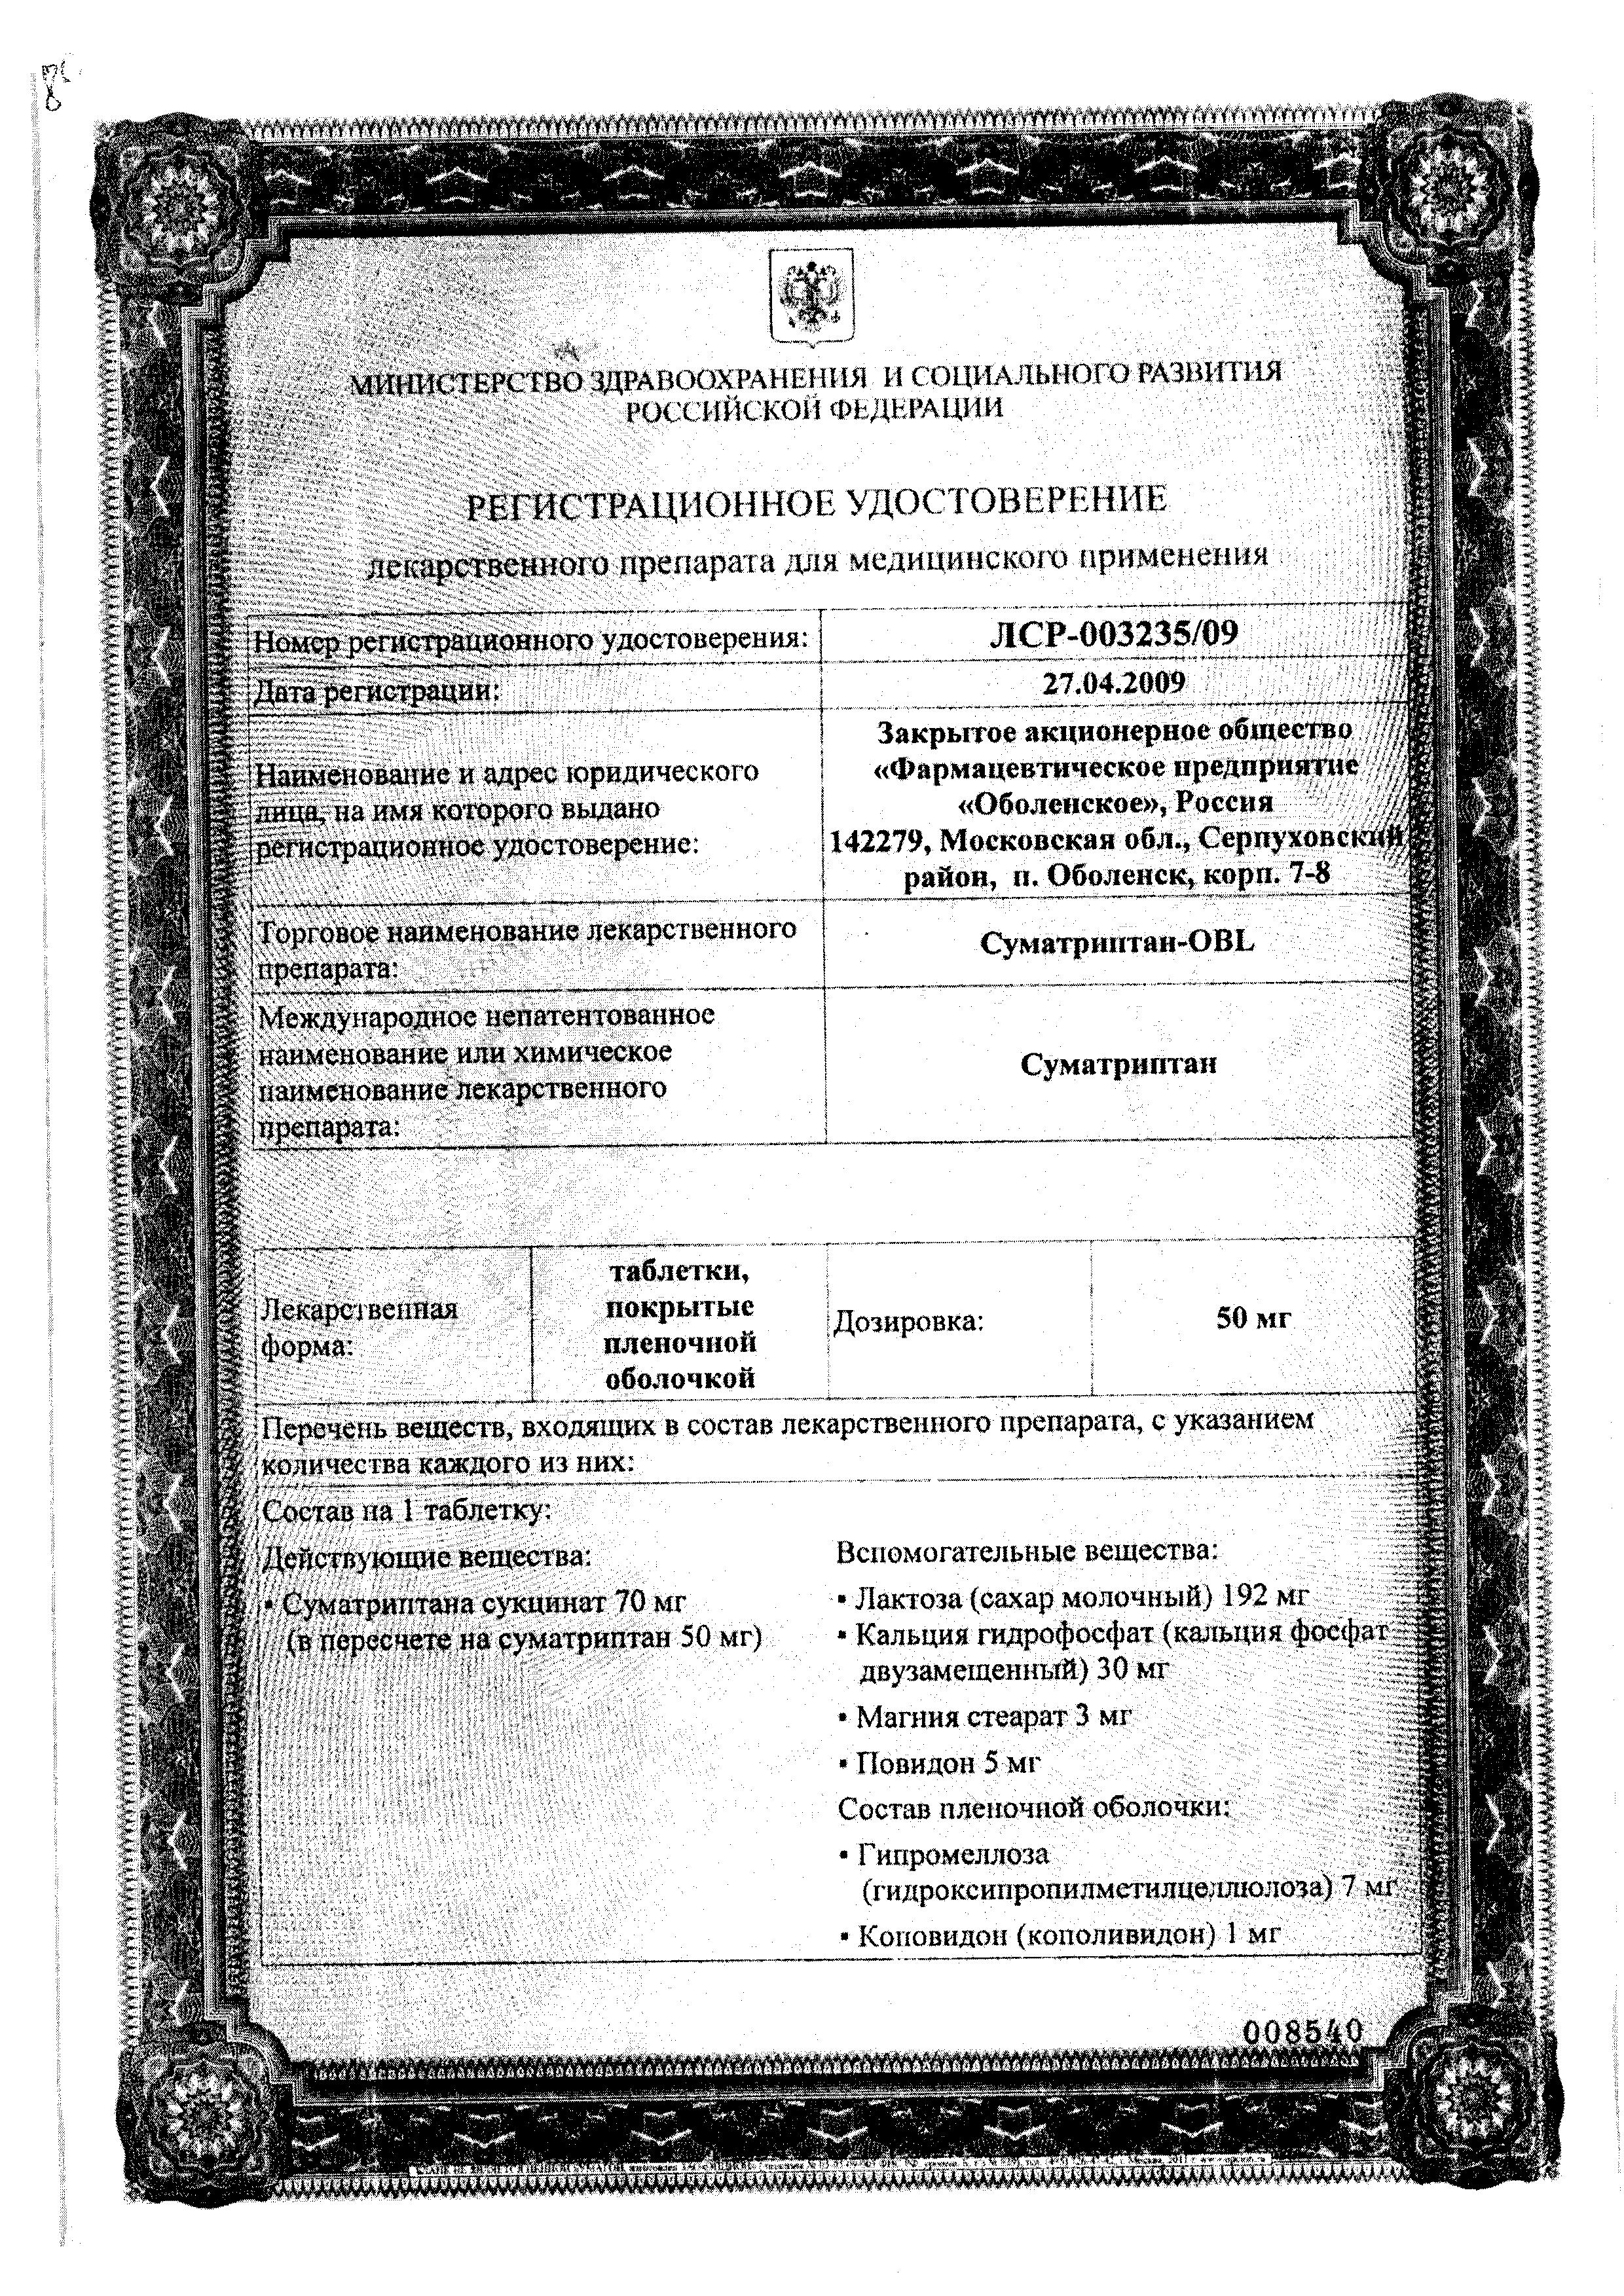 Суматриптан-OBL сертификат